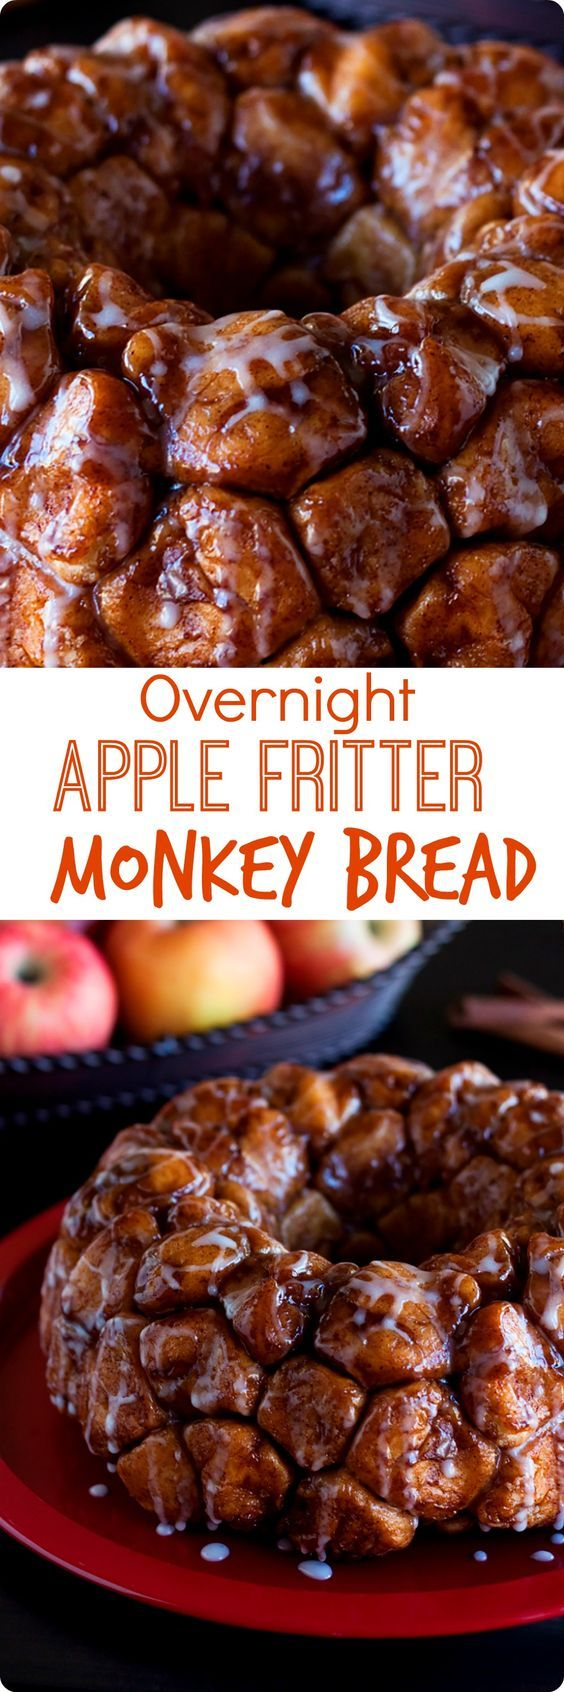 Overnight Apple Fritter Monkey Bread